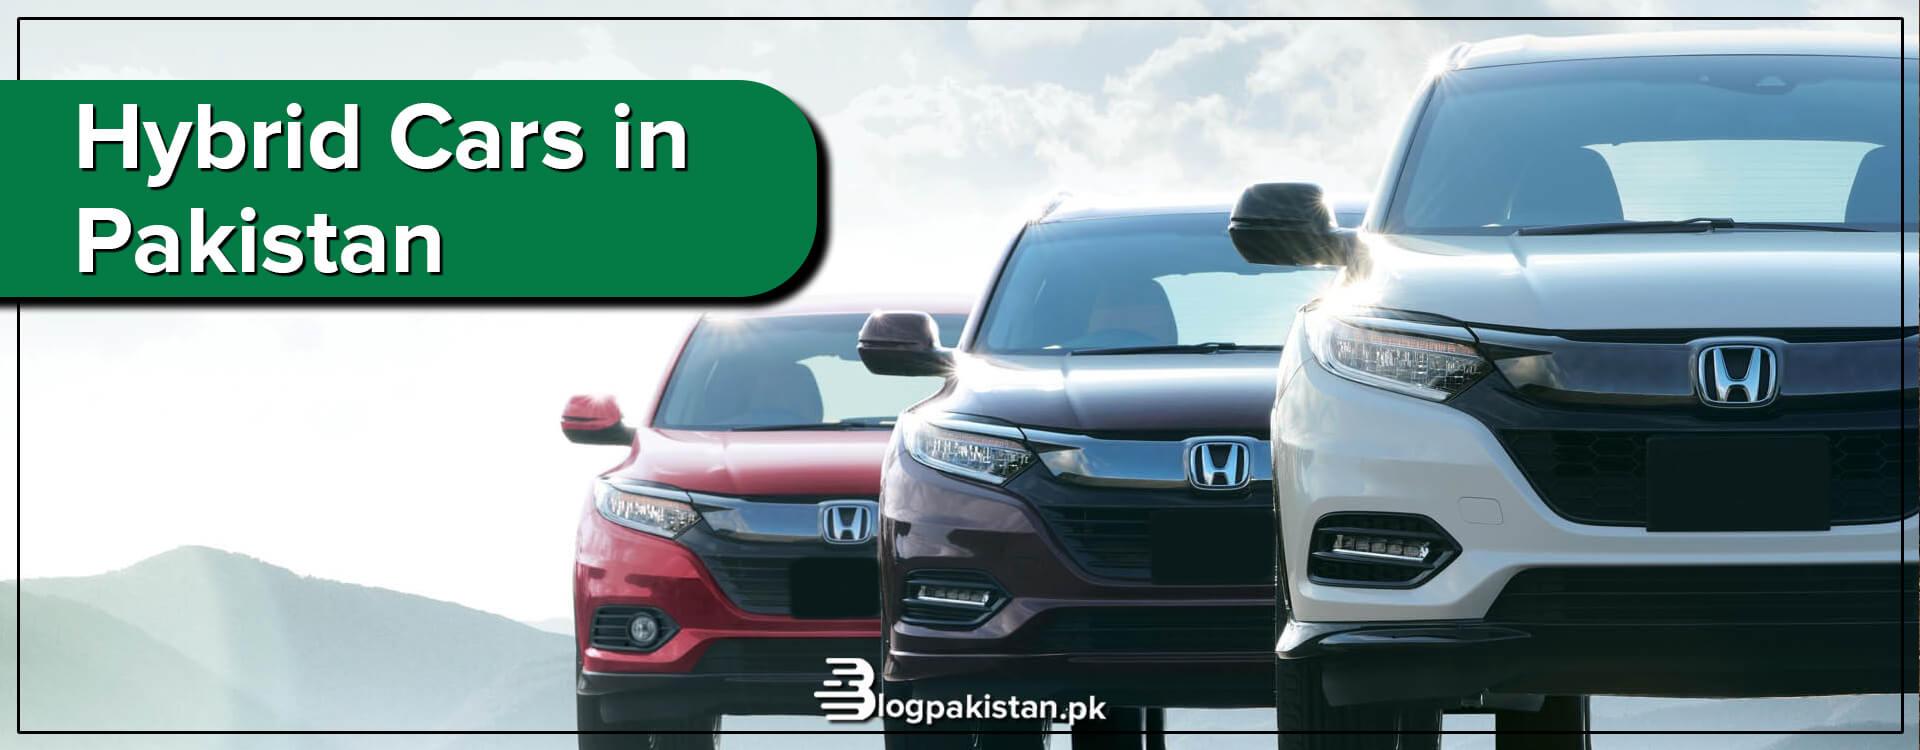 hybrid cars in Pakistan